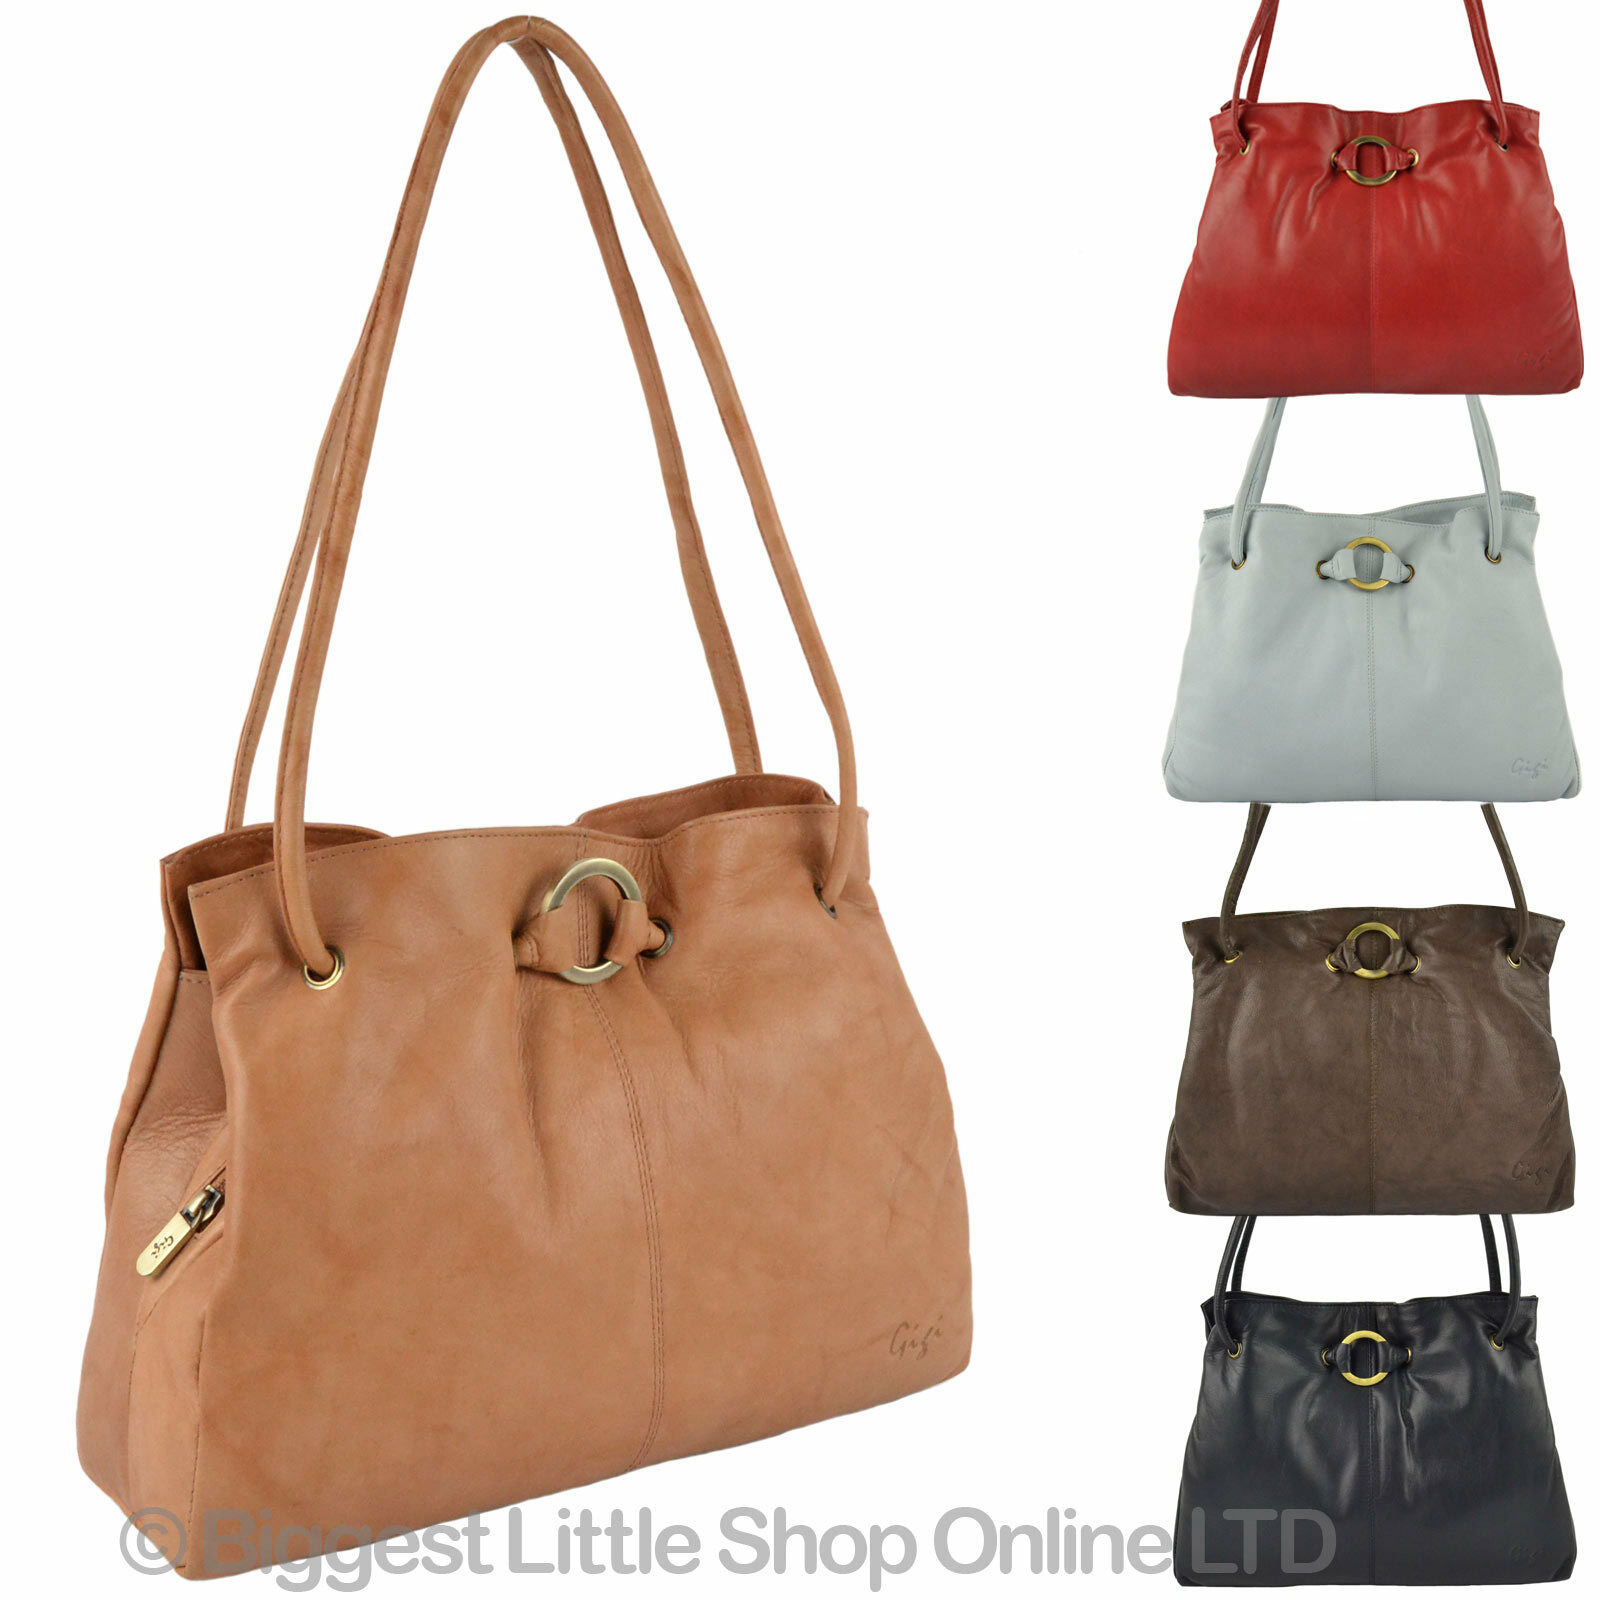 New Las Soft Leather Shoulder Handbag By Gigi Oto Collection Classic